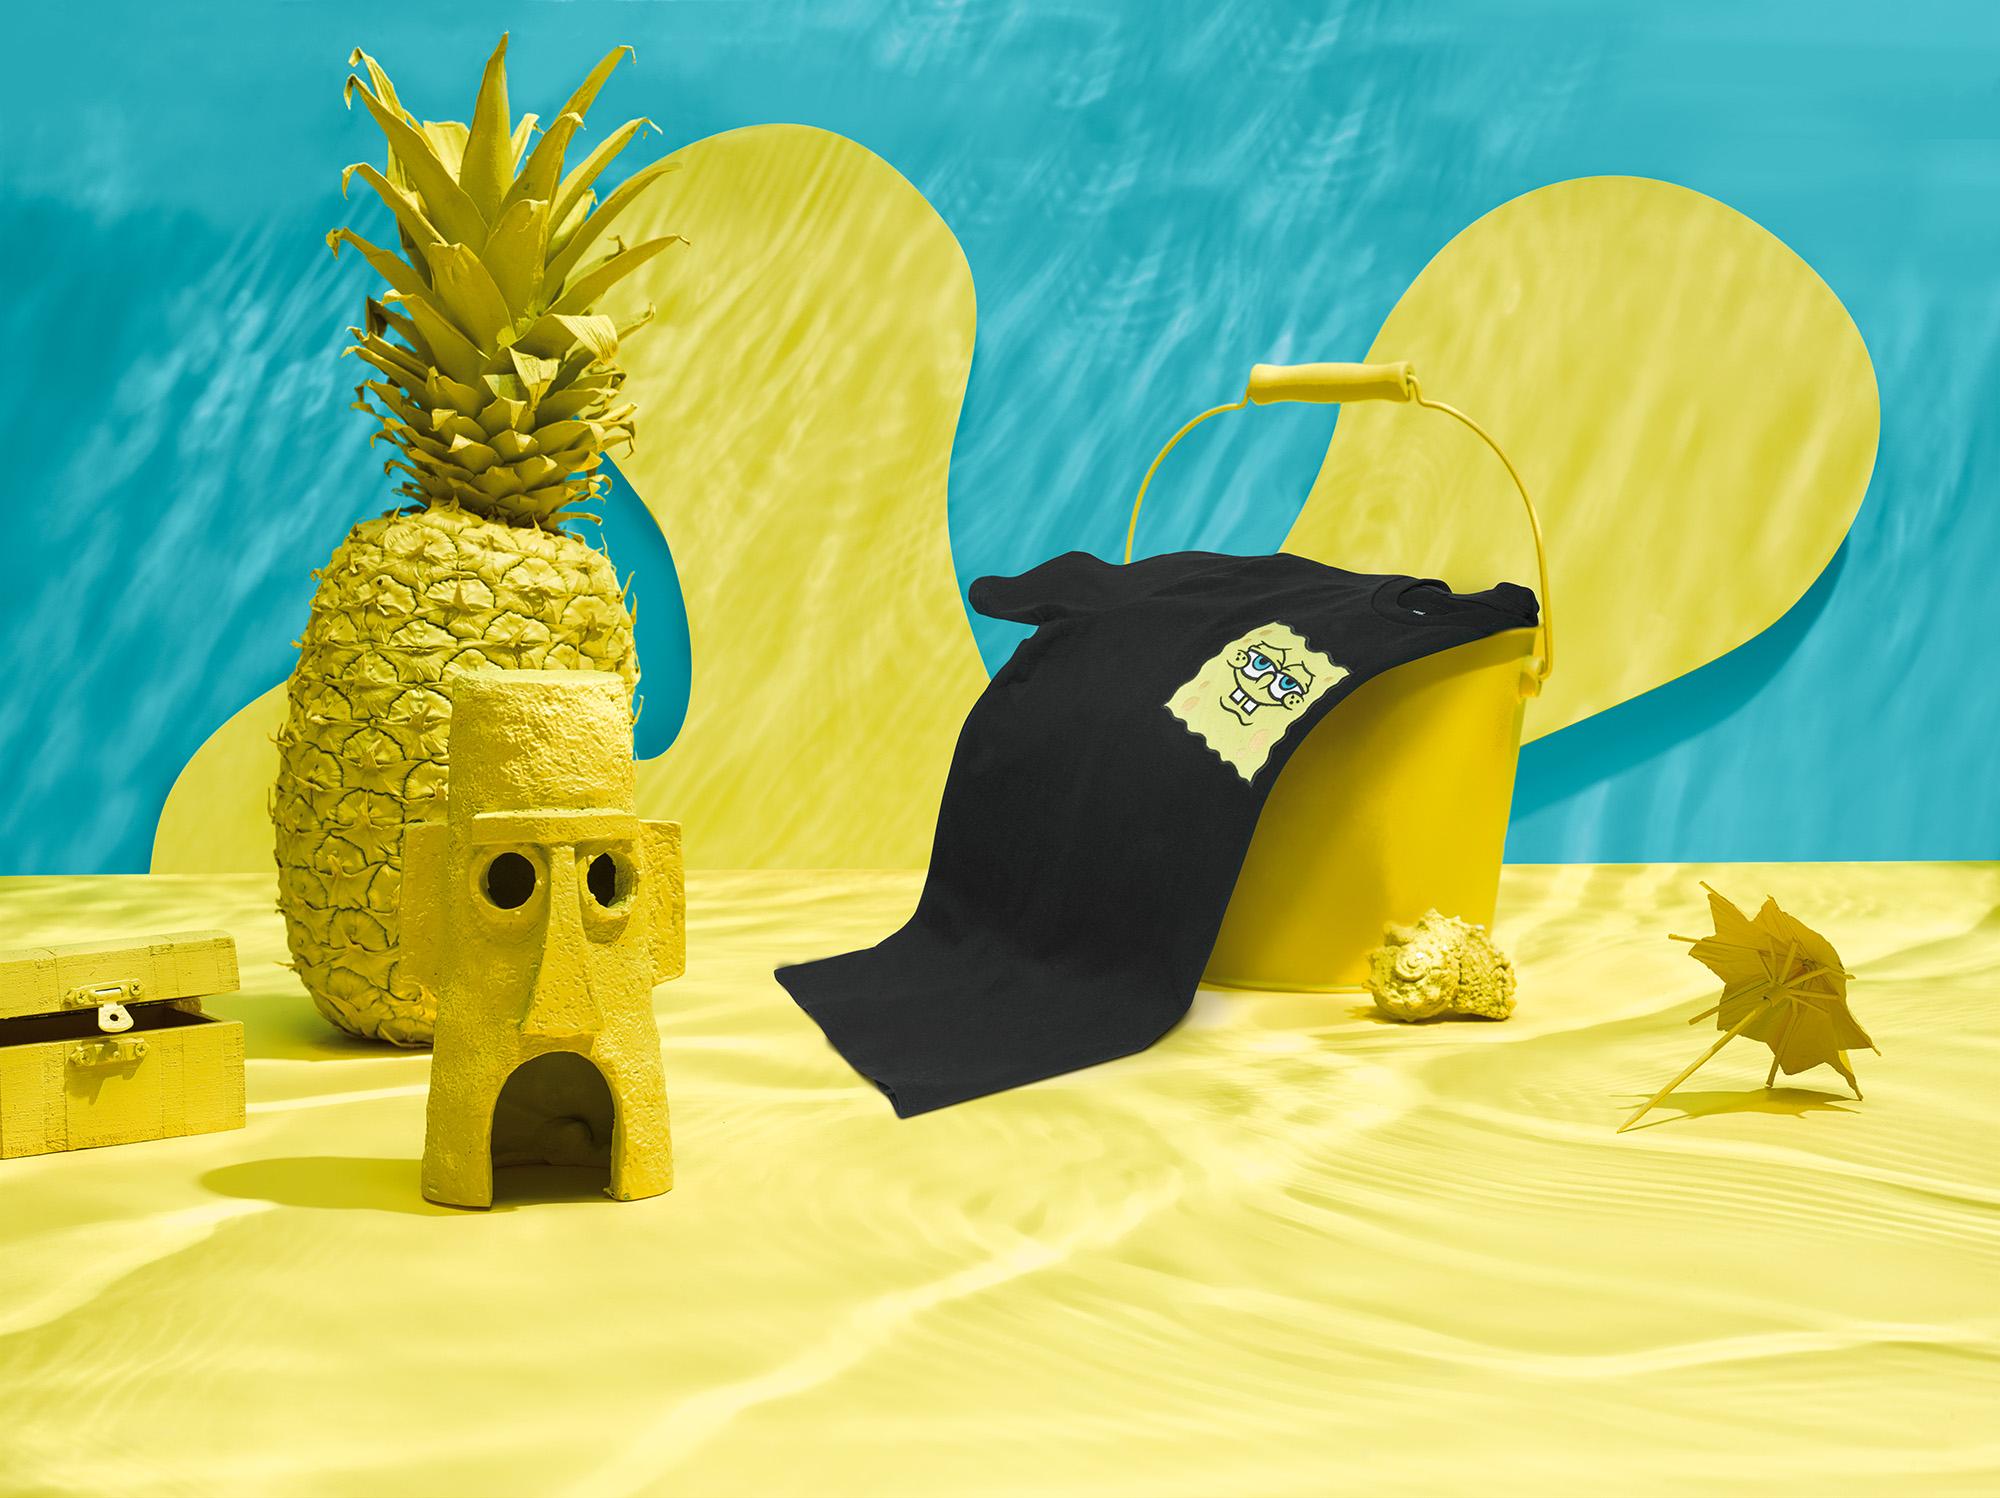 Vault by Vans x Spongebob SquarePants 2